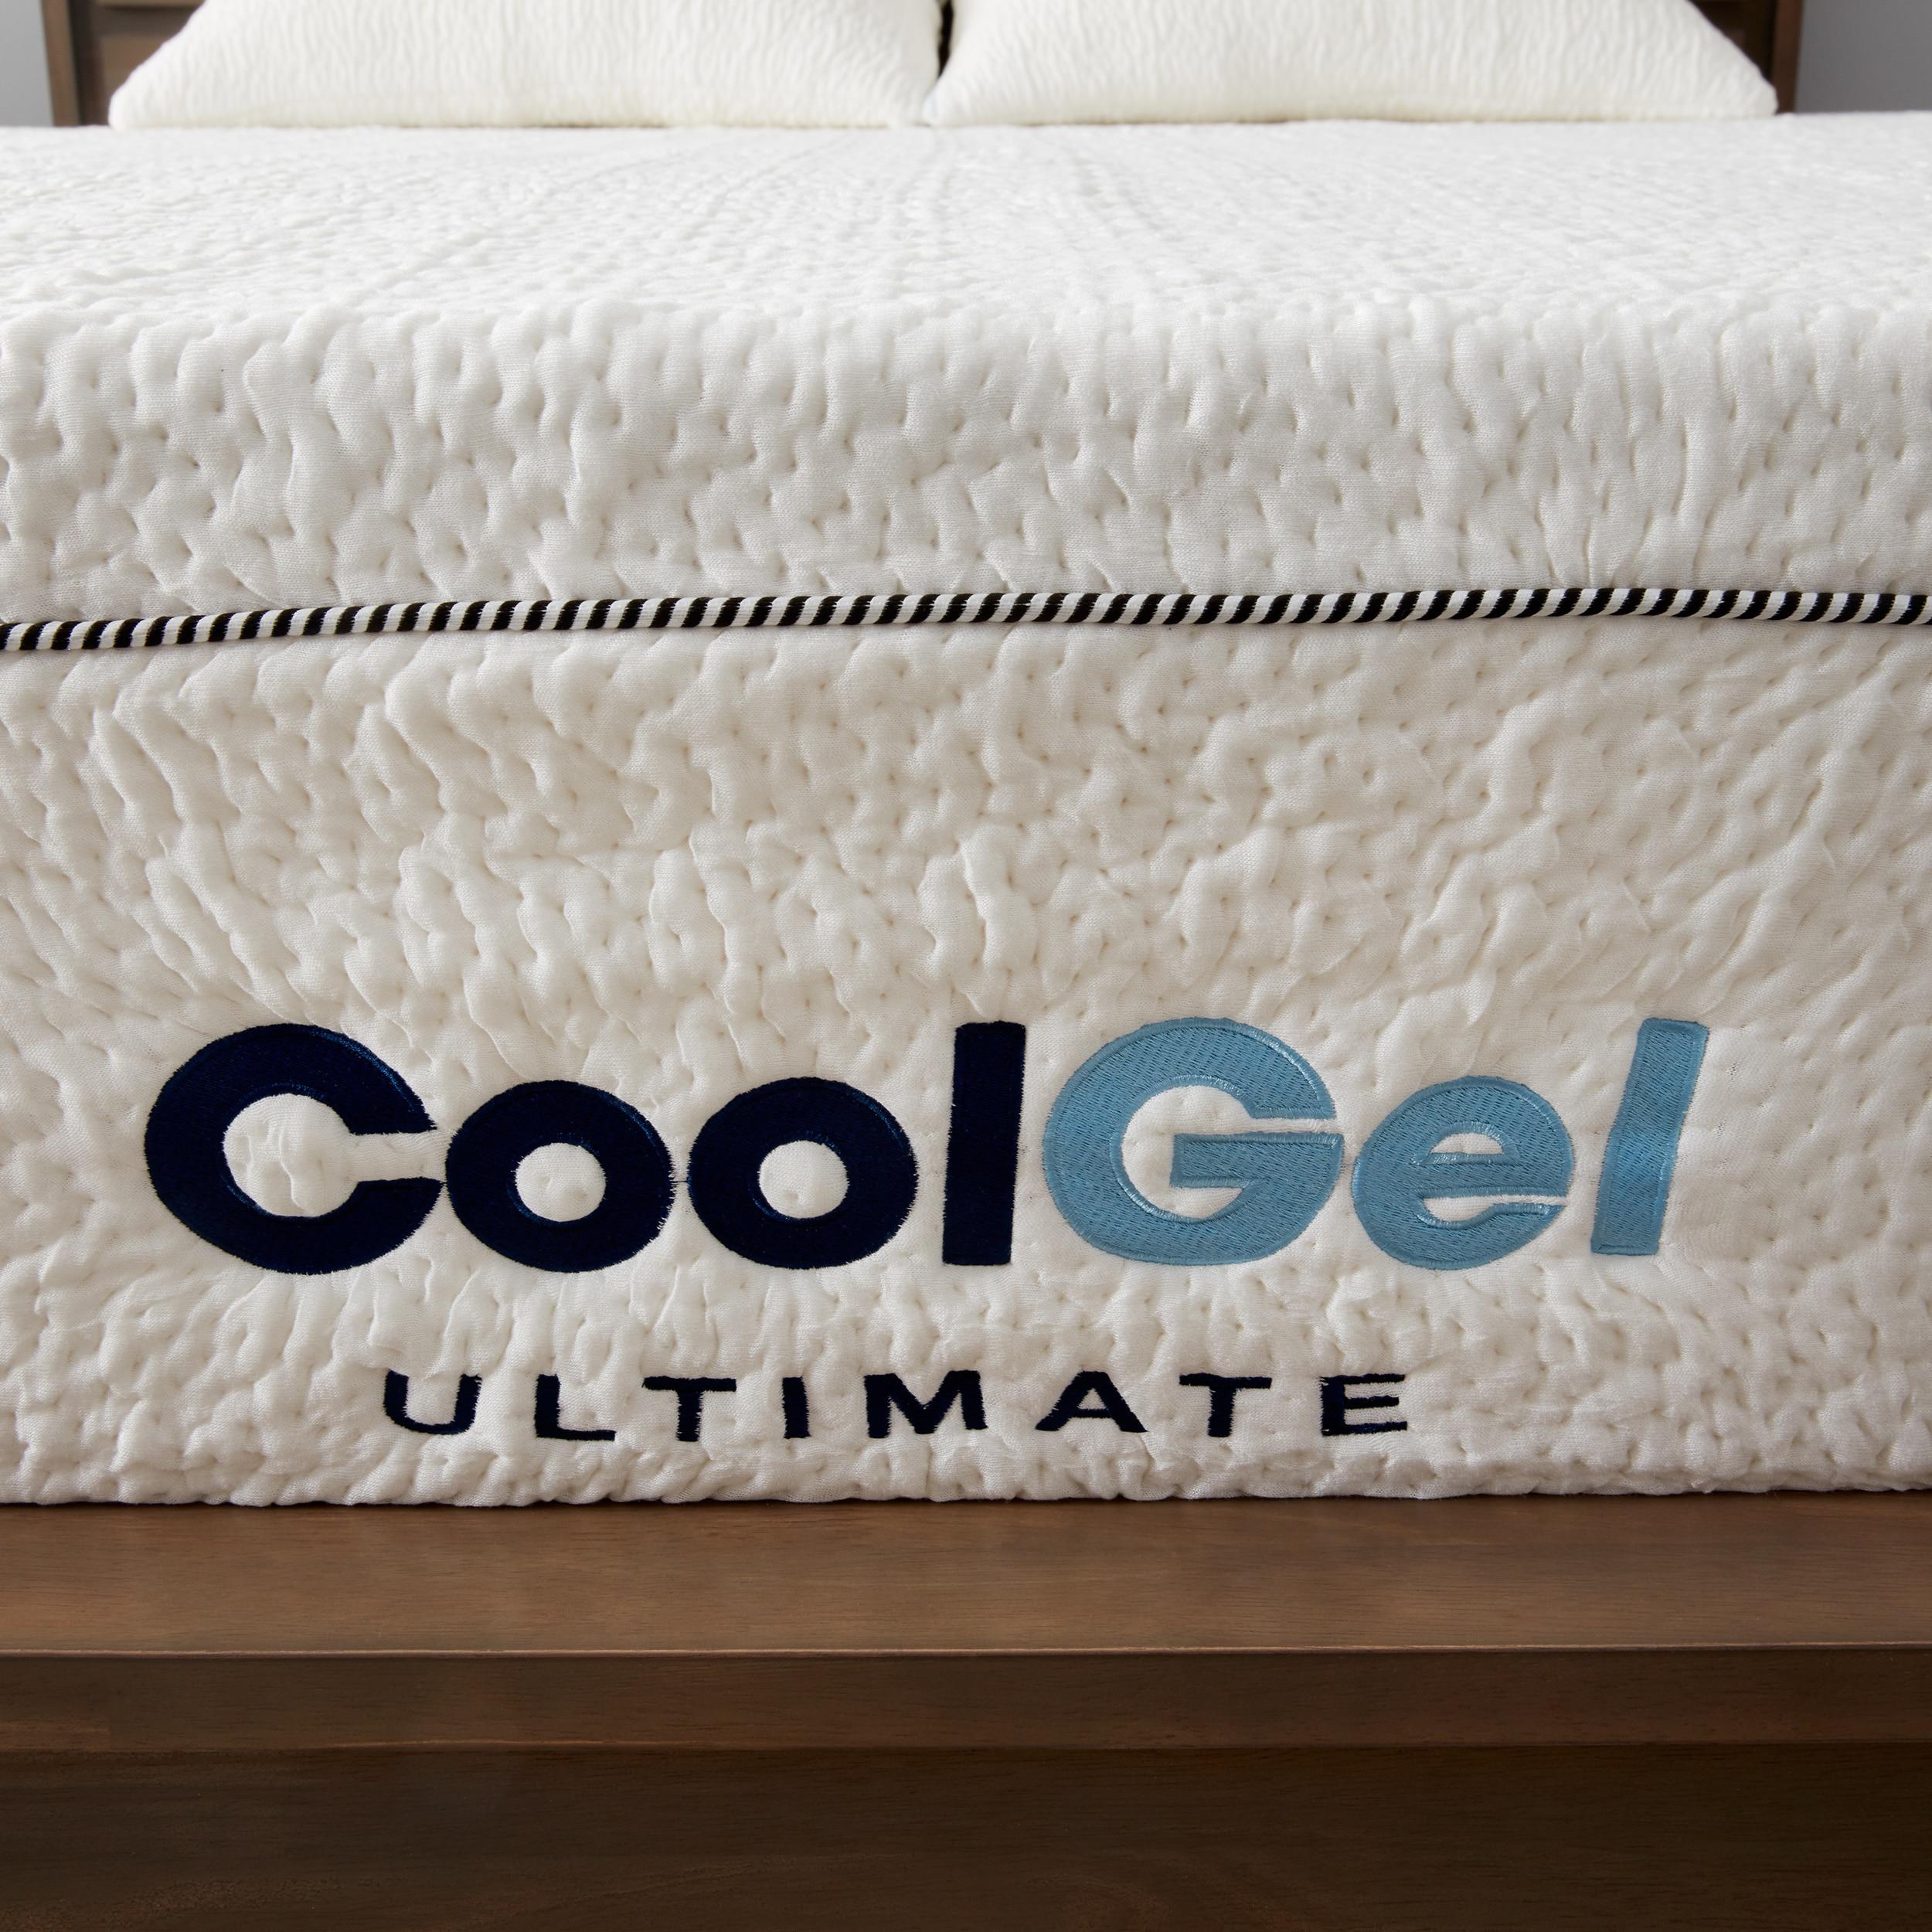 postureloft 14 inch queen size gel memory foam mattress with 2